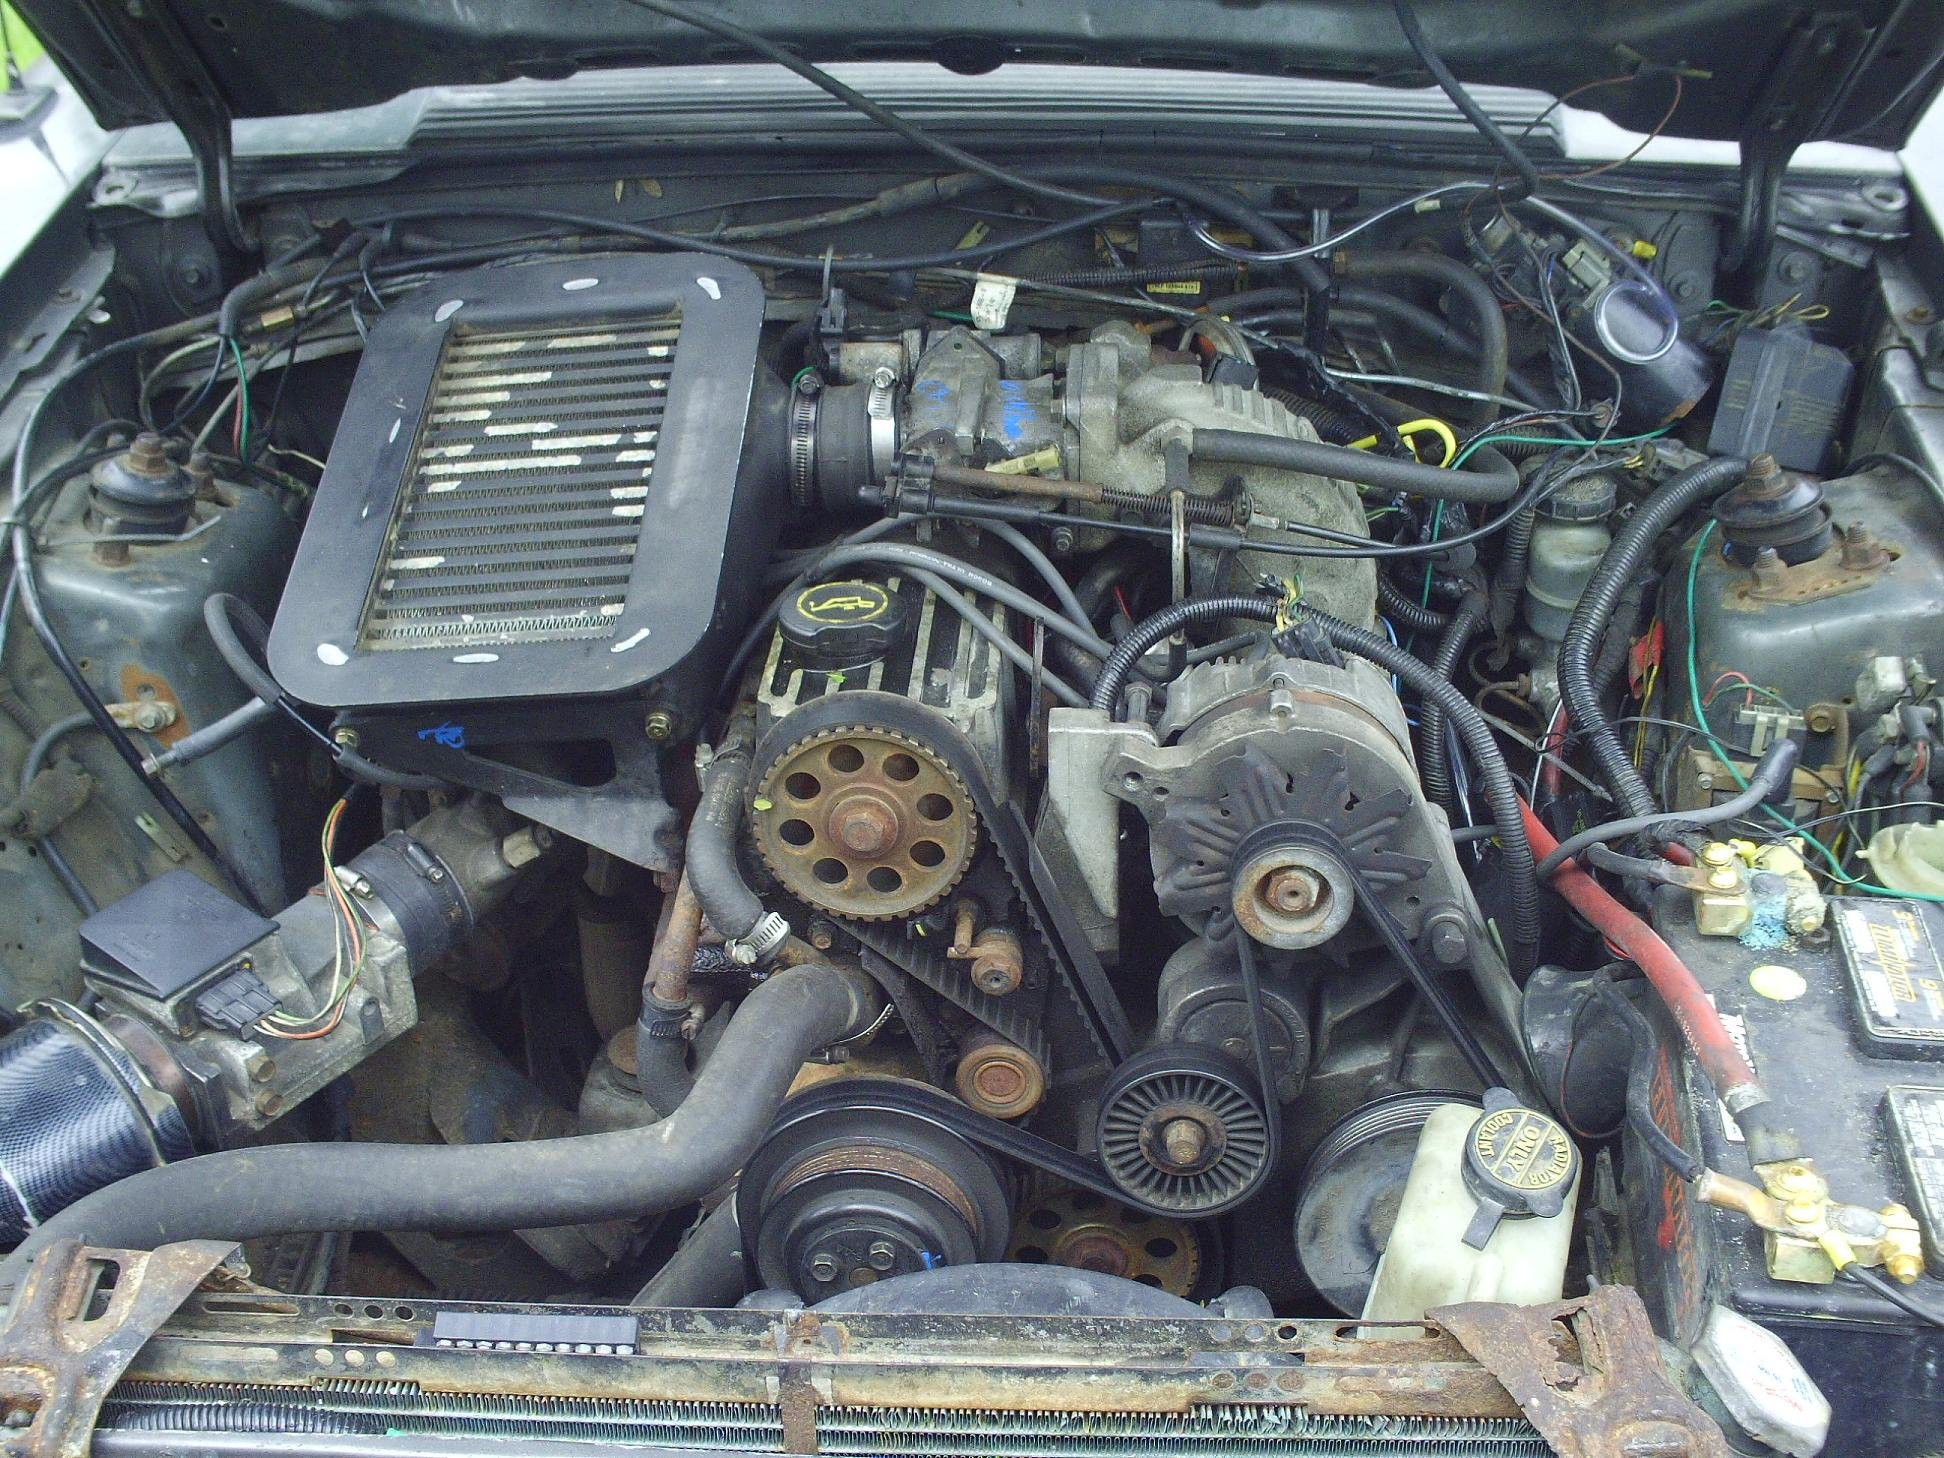 69197d1242044944 2 3 turbo swap start finish pict0004 2 3 turbo swap start to finish ford mustang forum